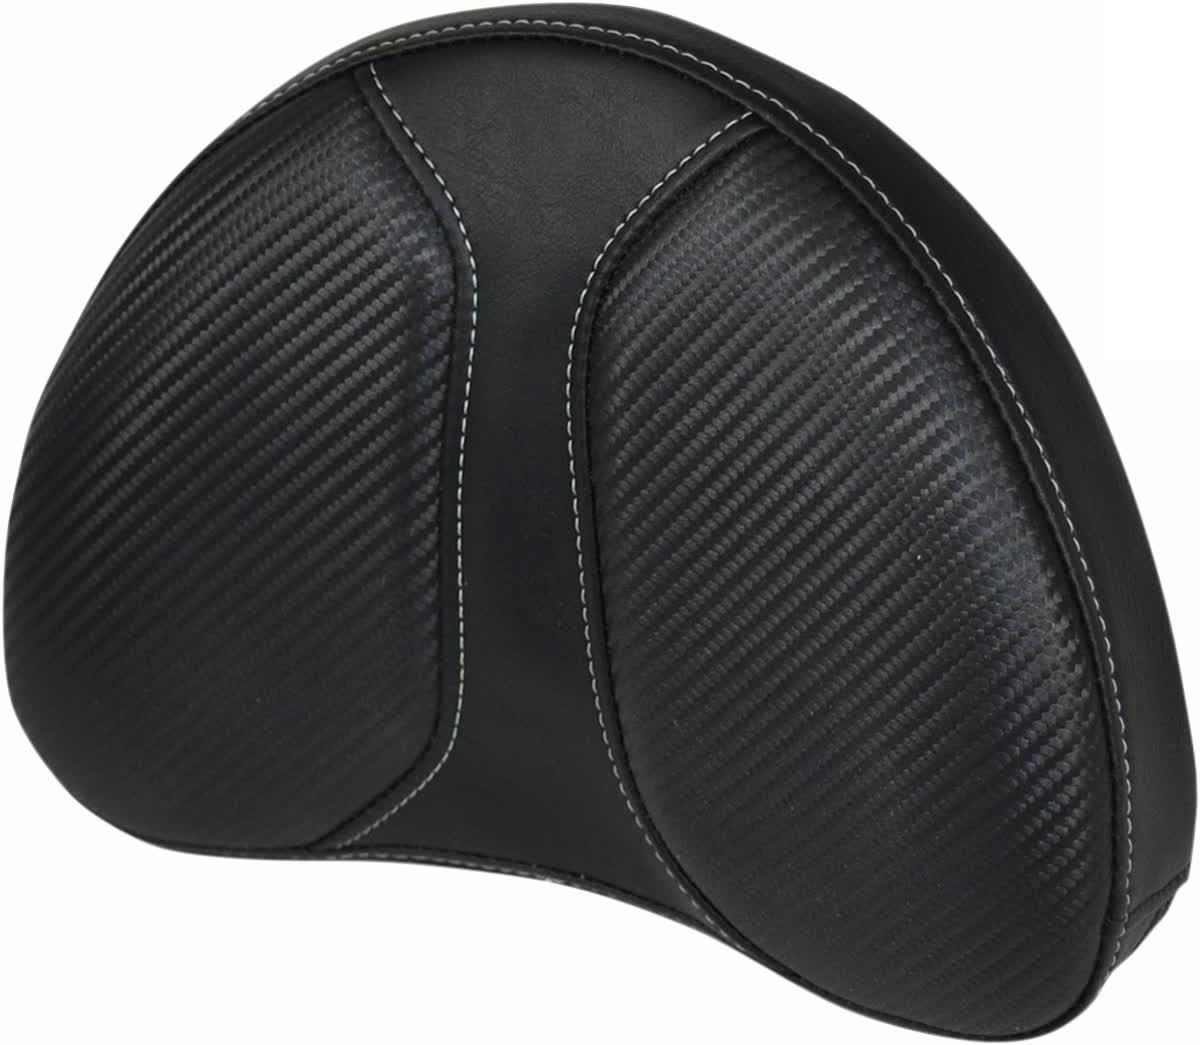 Saddlemen 051342 Half-Moon Sissy Bar Pad for Dominator Style Seat